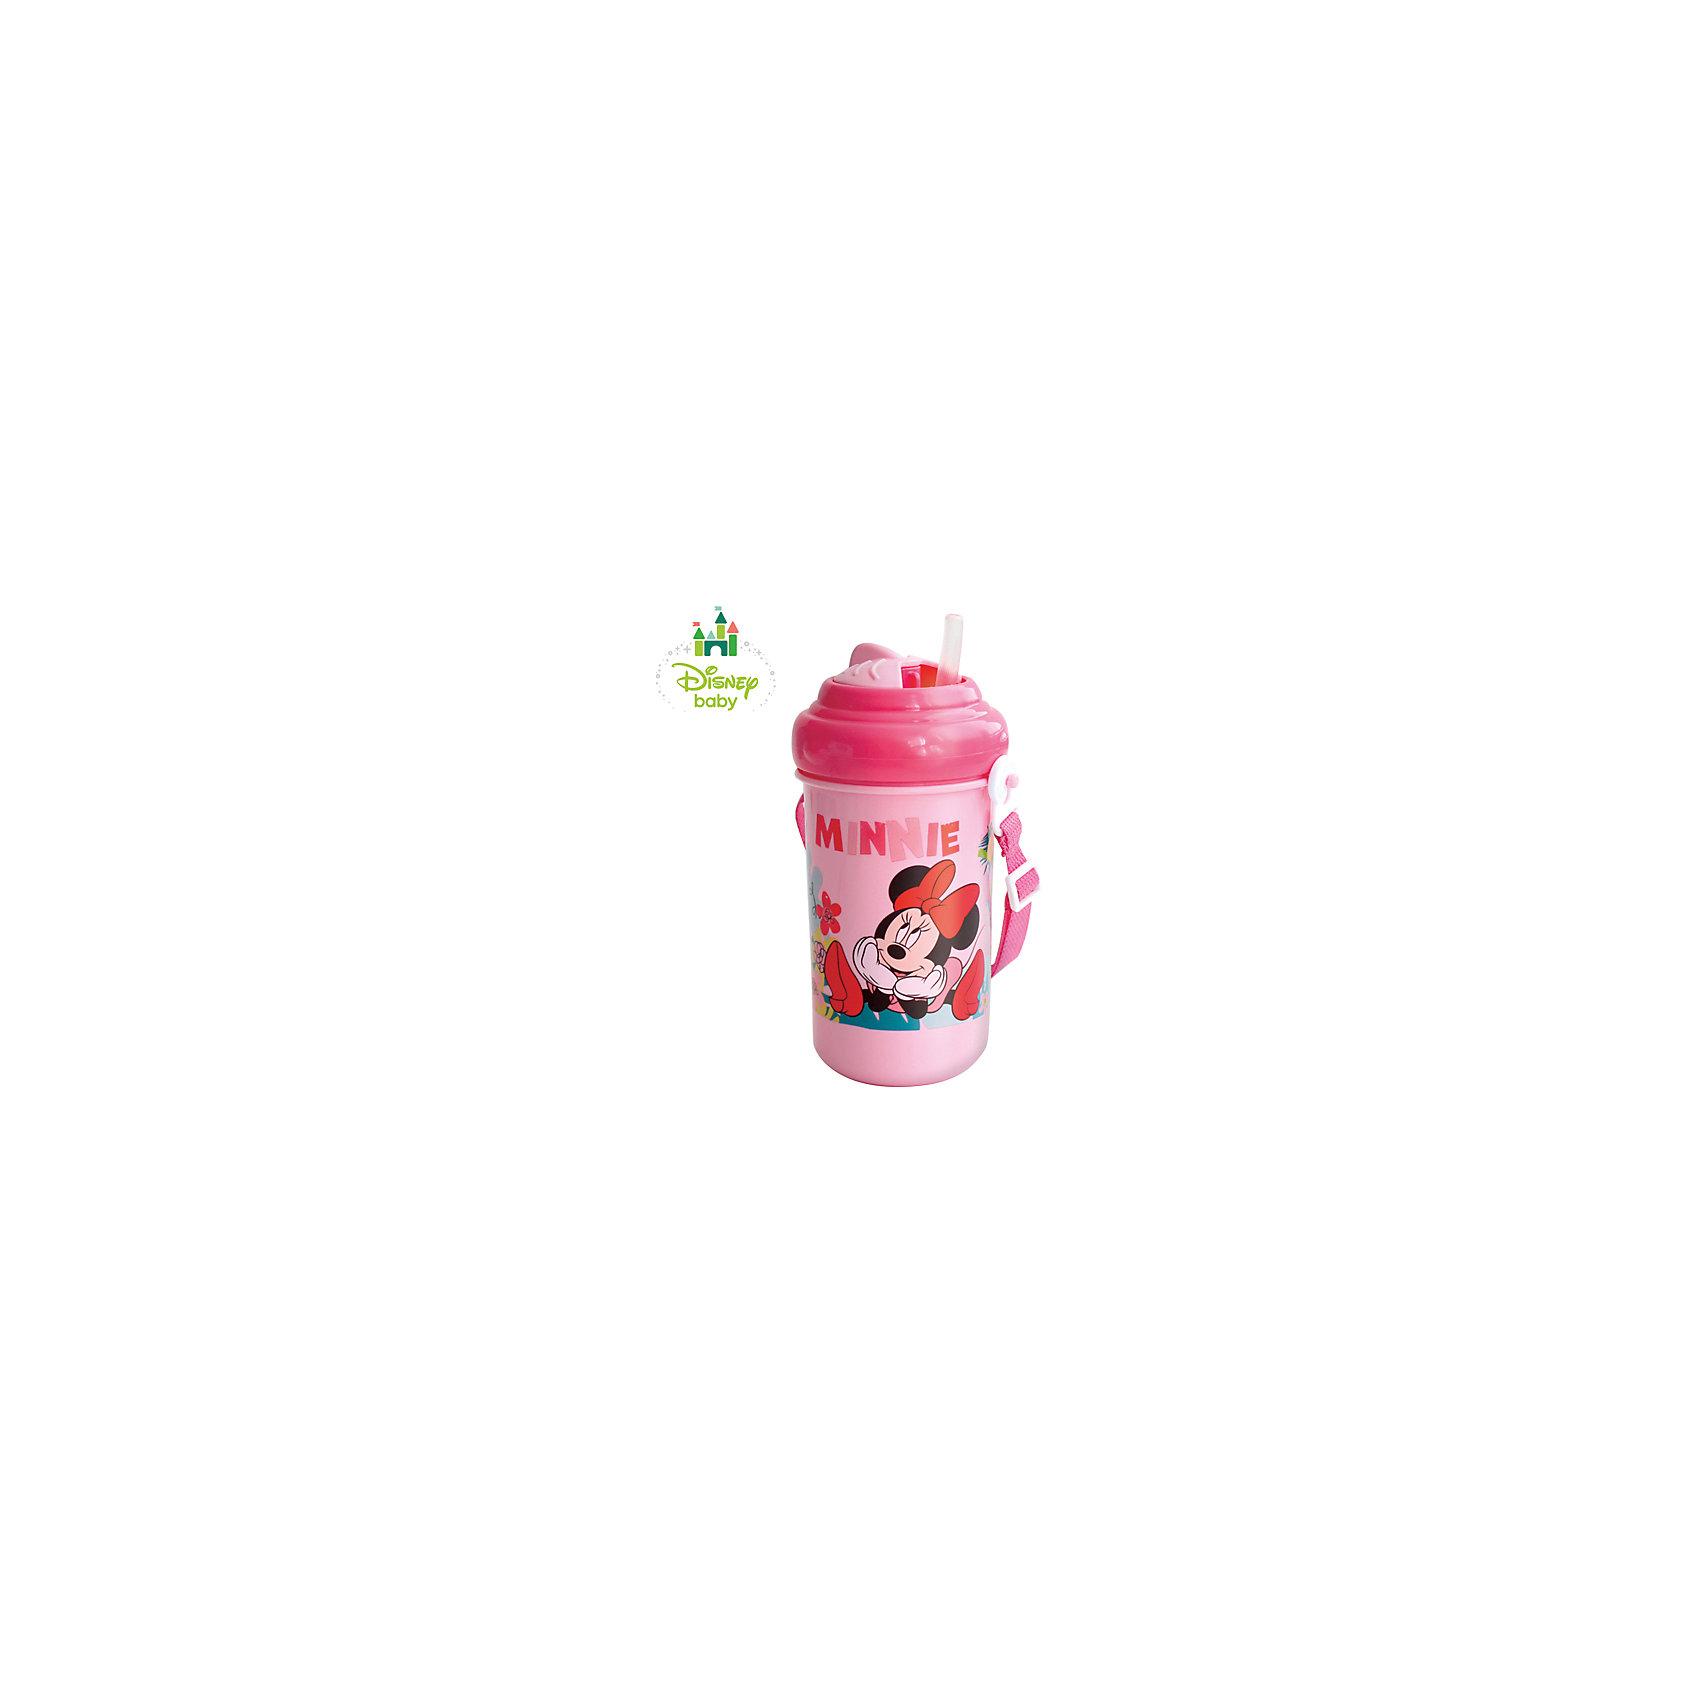 Поильник Минни DISNEY 360 мл.,от 6 мес., LUBBY, розовый матовый